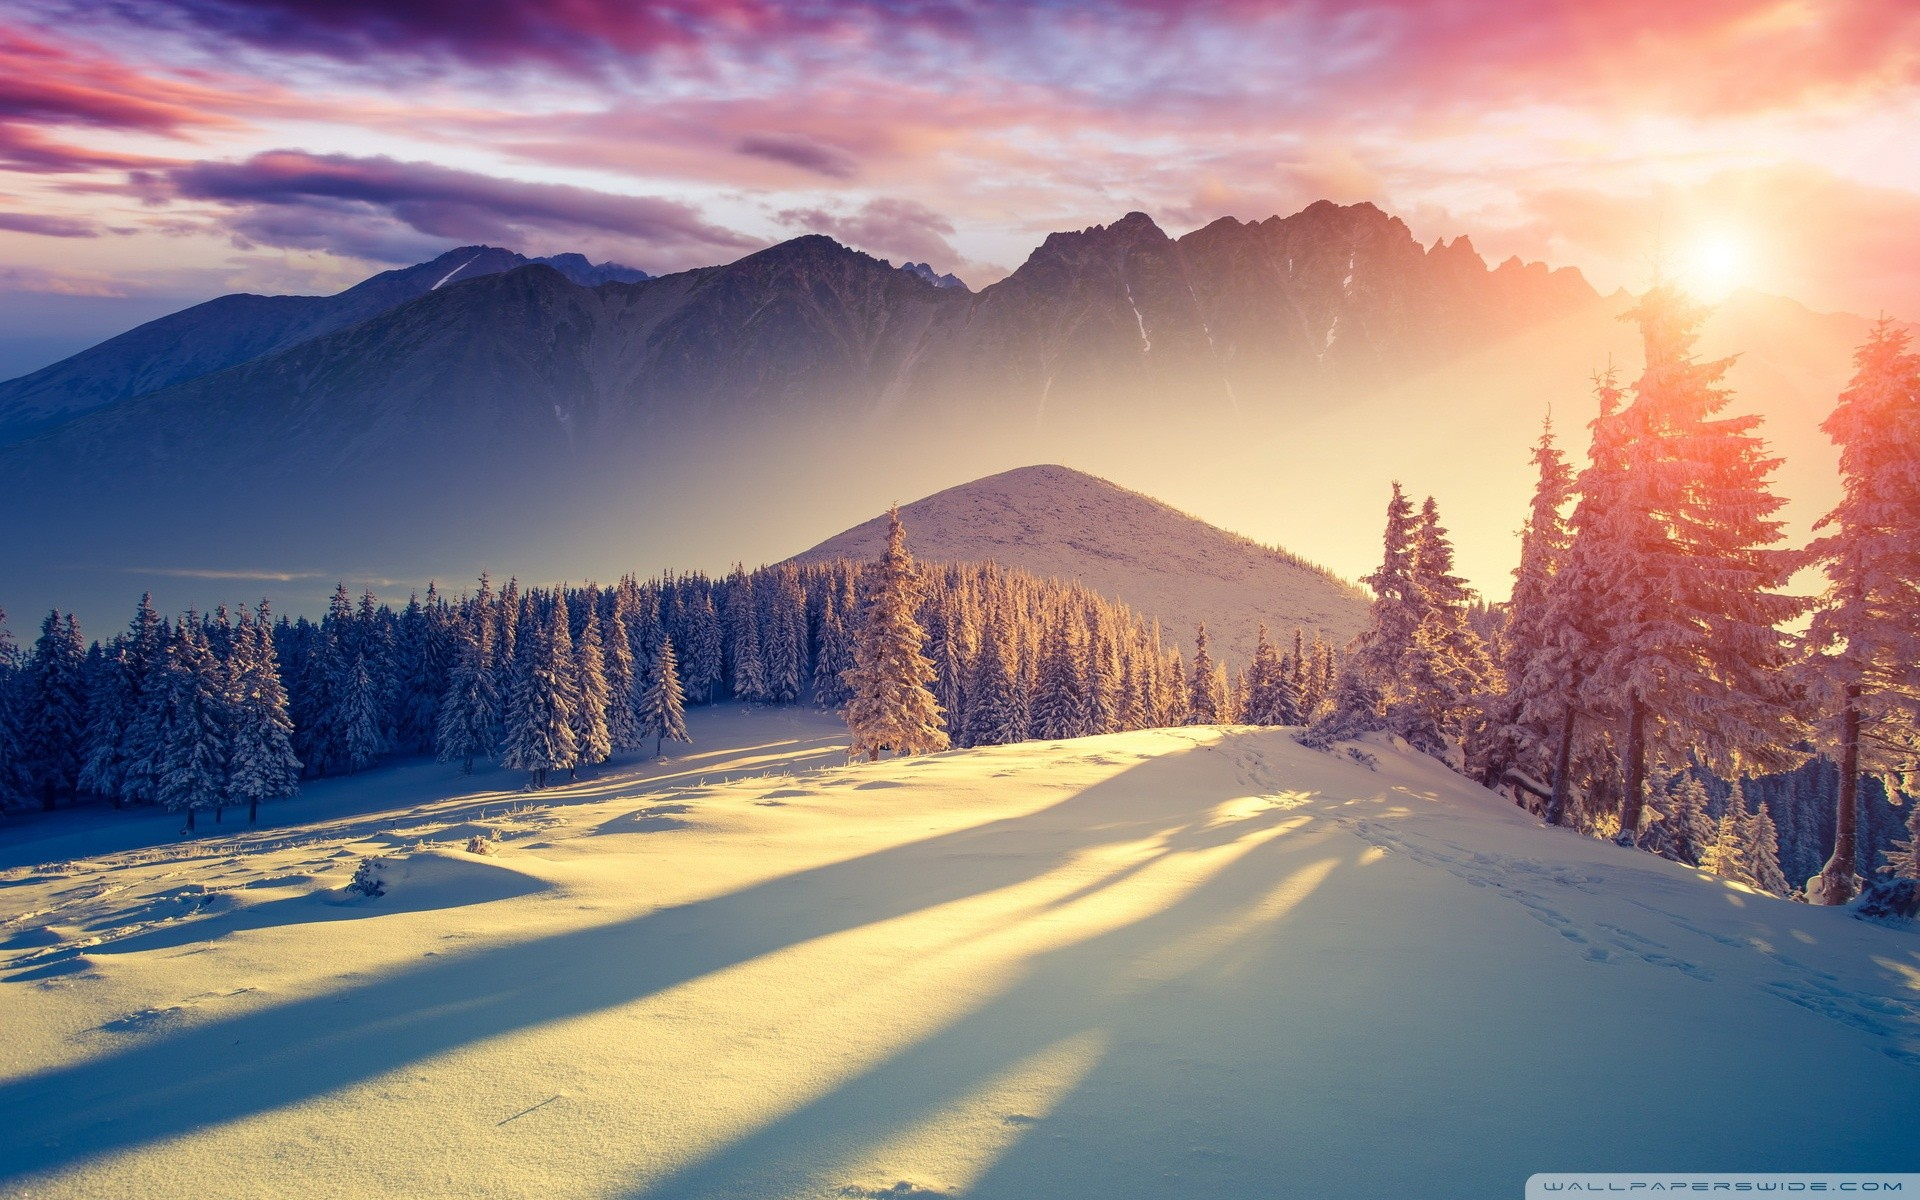 Beautiful winter wonderland wallpaper ideal for winter